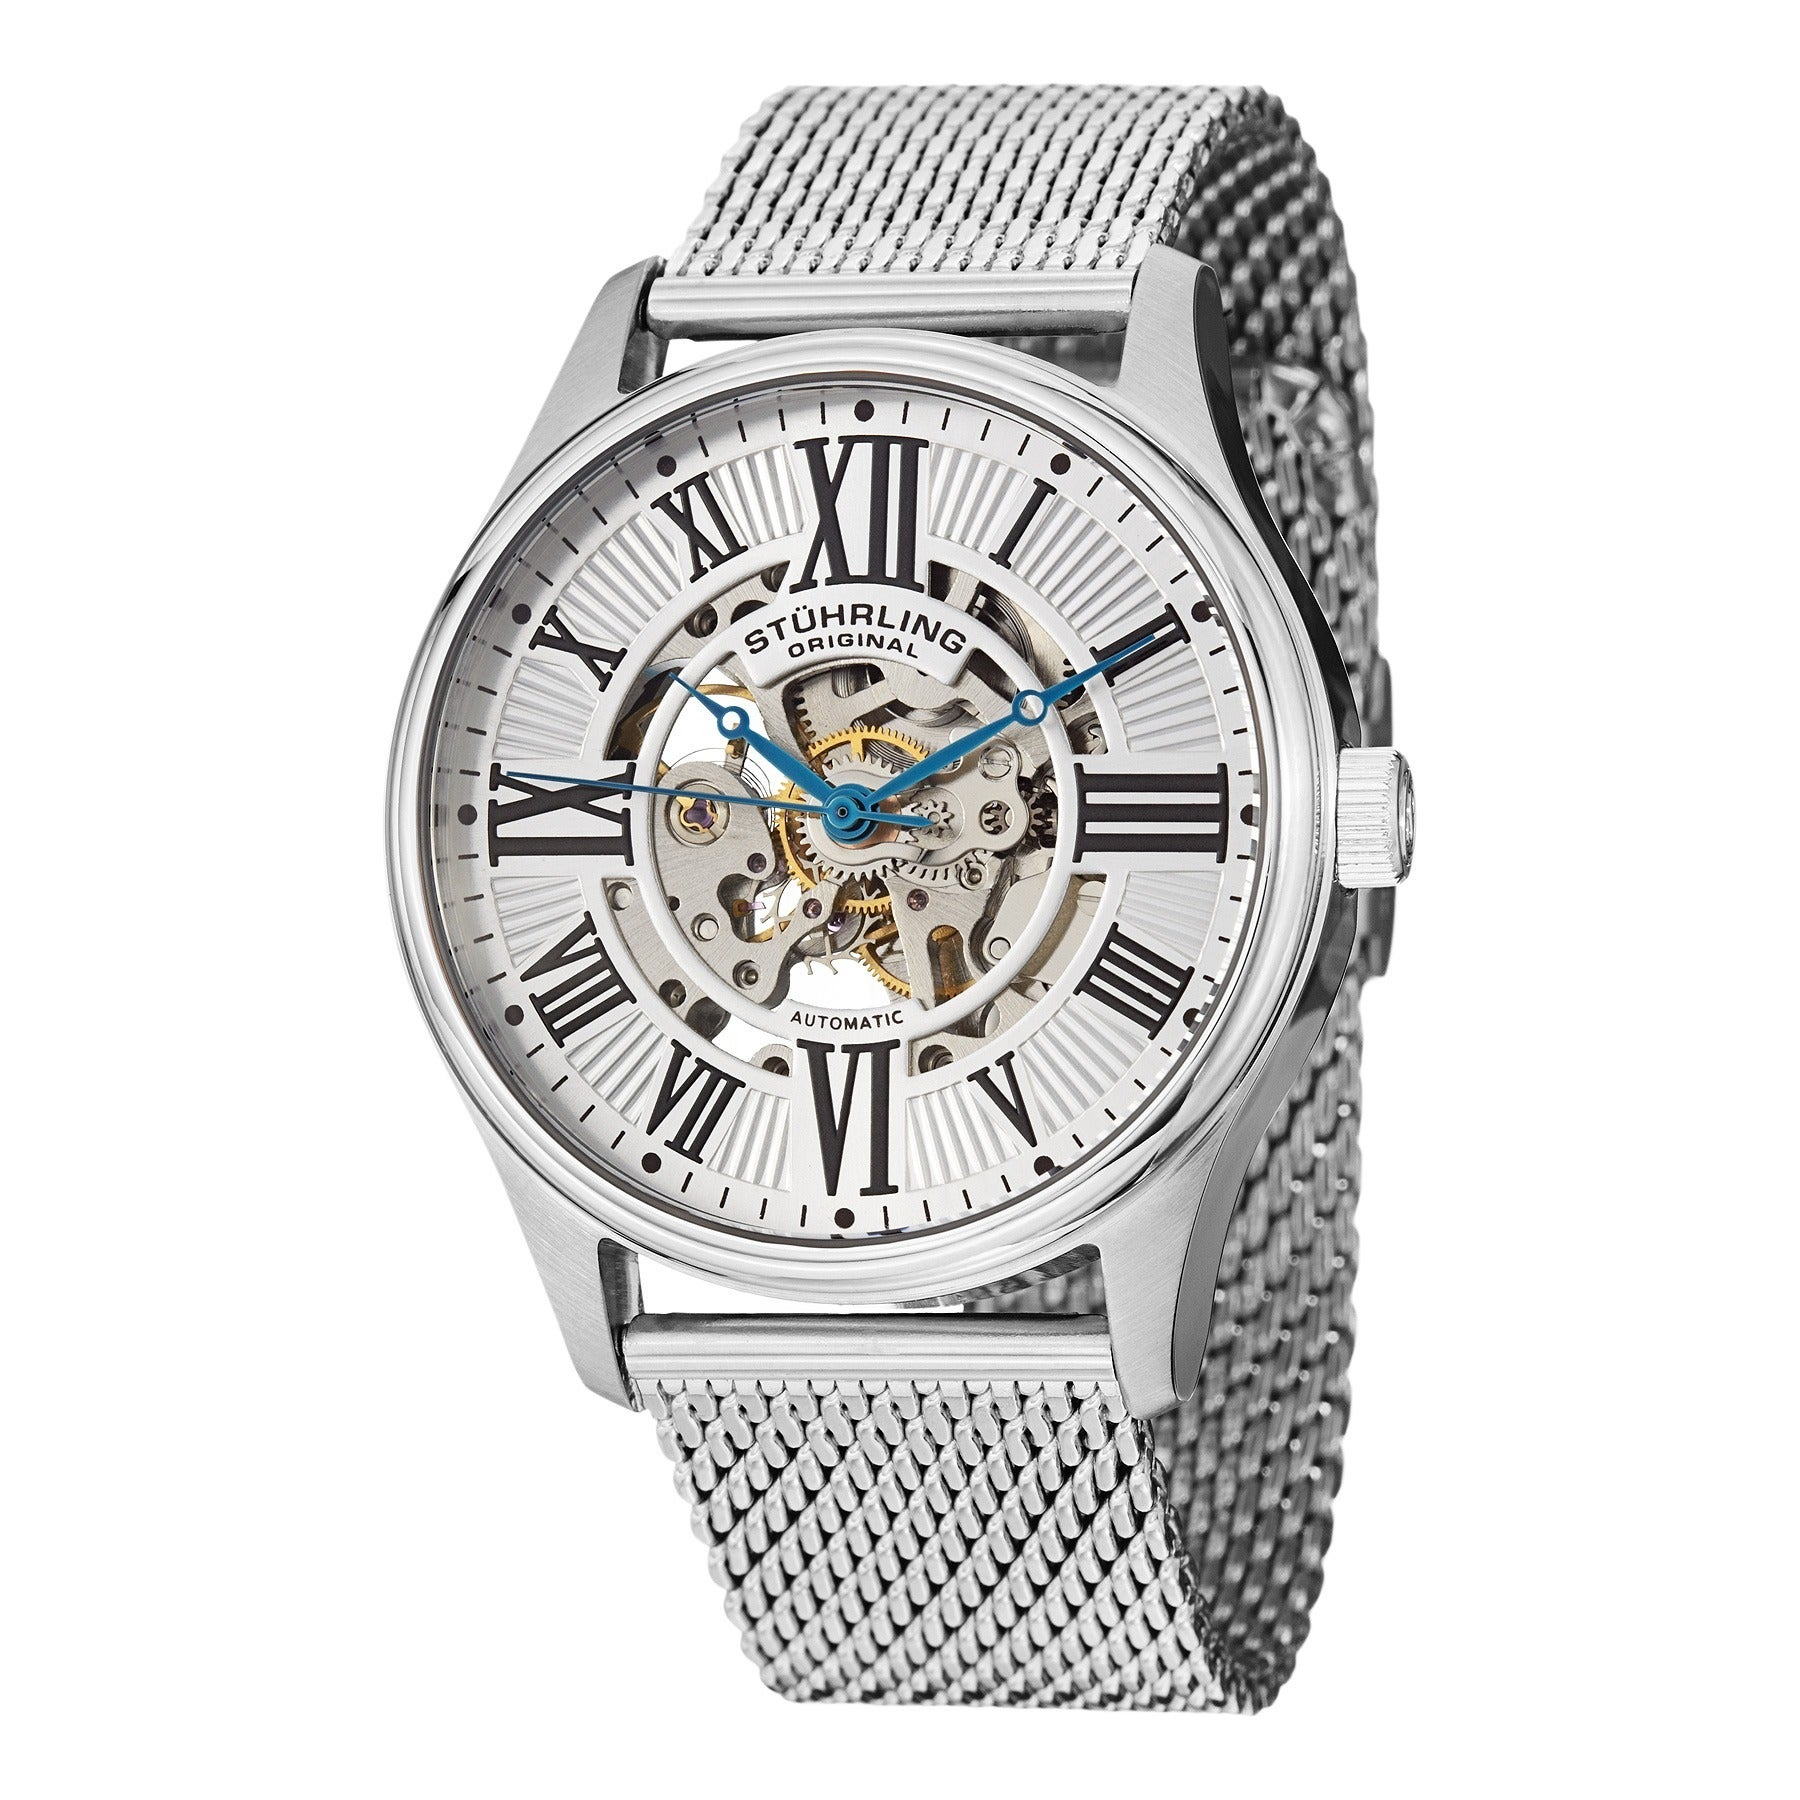 da46e530e Stuhrling Original Men's Atrium Elite Automatic Skeleton Stainless Steel  Mesh Band Watch